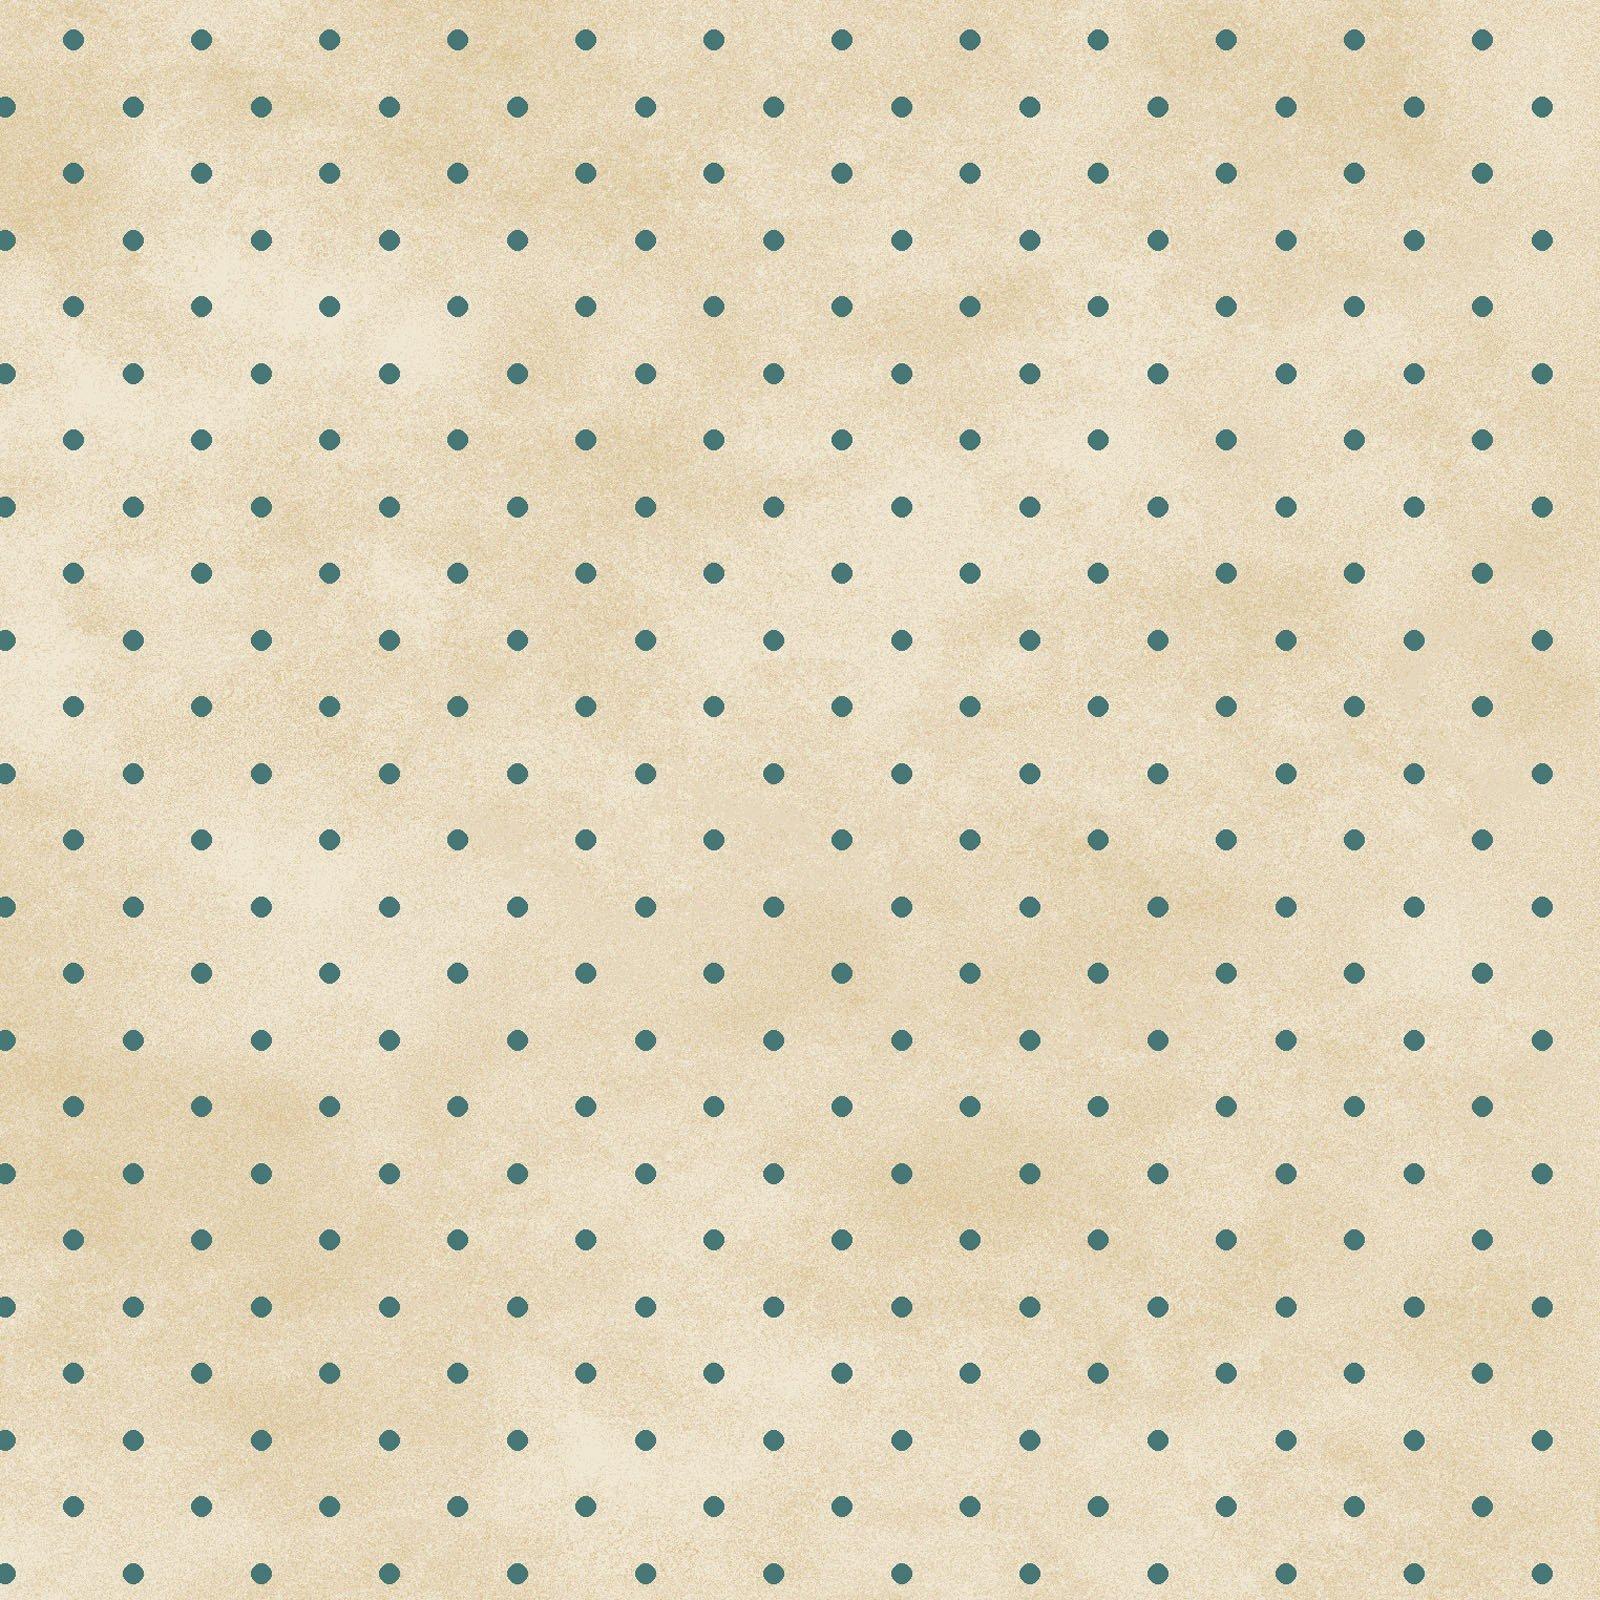 Dot Cream/Teal